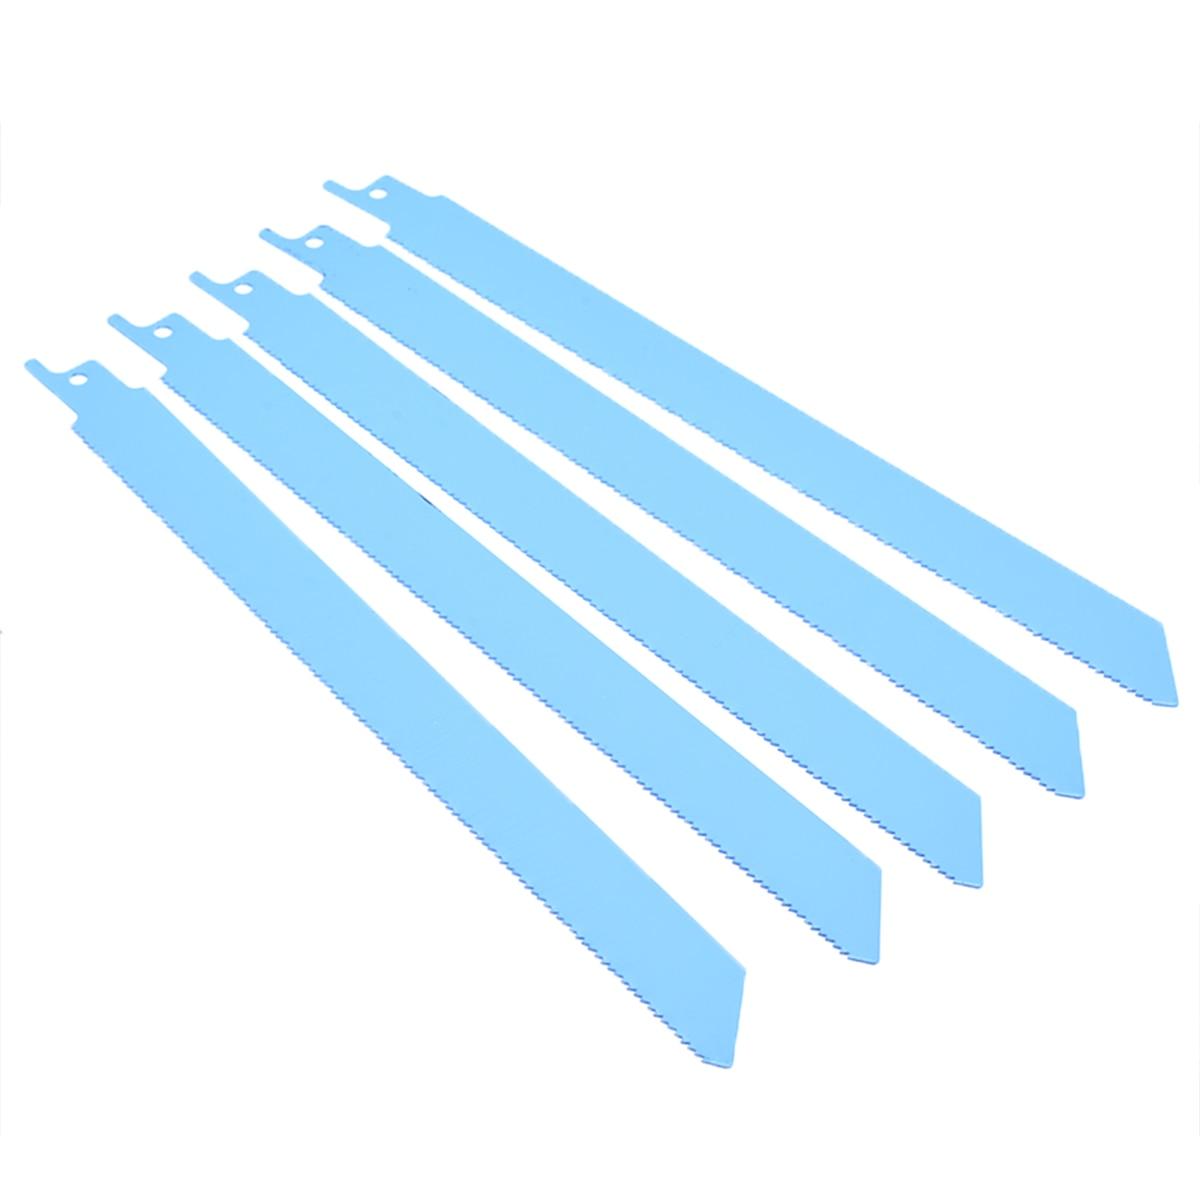 5pcs/set 225mm Metal Recip Saw Blades Sharp Reciprocating Saw Blades Flexible Jig Saw Tools 18tpi DIY Wood Cutting Blades Tool